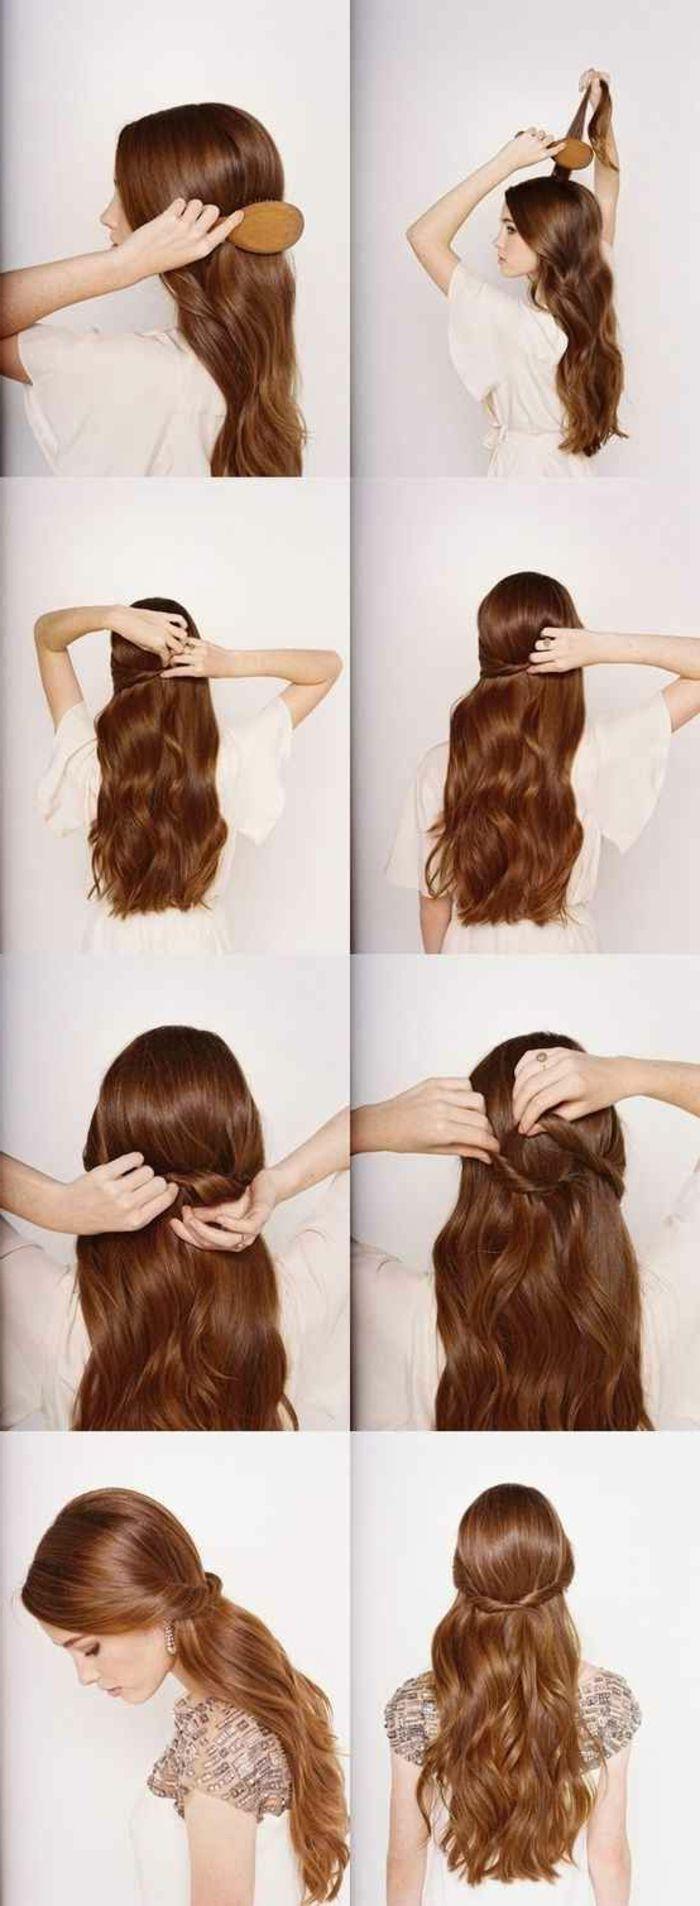 tuto coiffure cheveux longs marrons